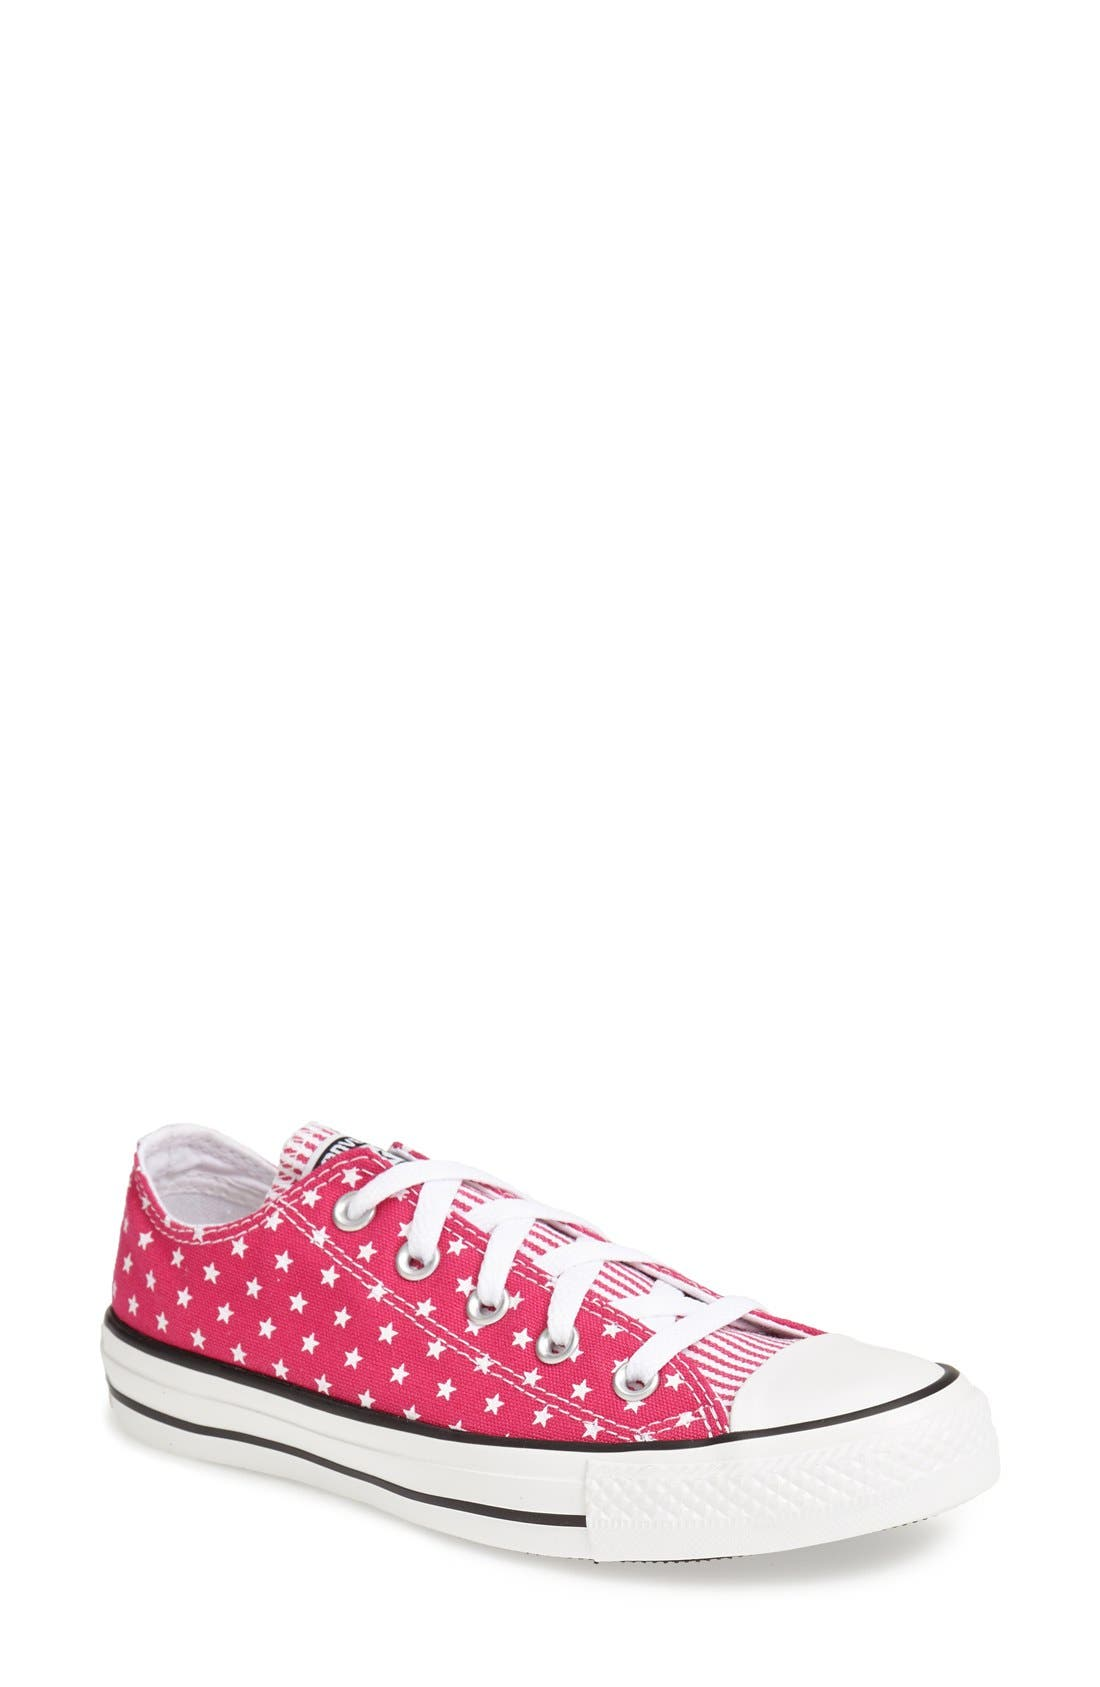 Main Image - Converse Chuck Taylor® All Star® 'Mini Stars & Bars' Low Sneaker (Women)